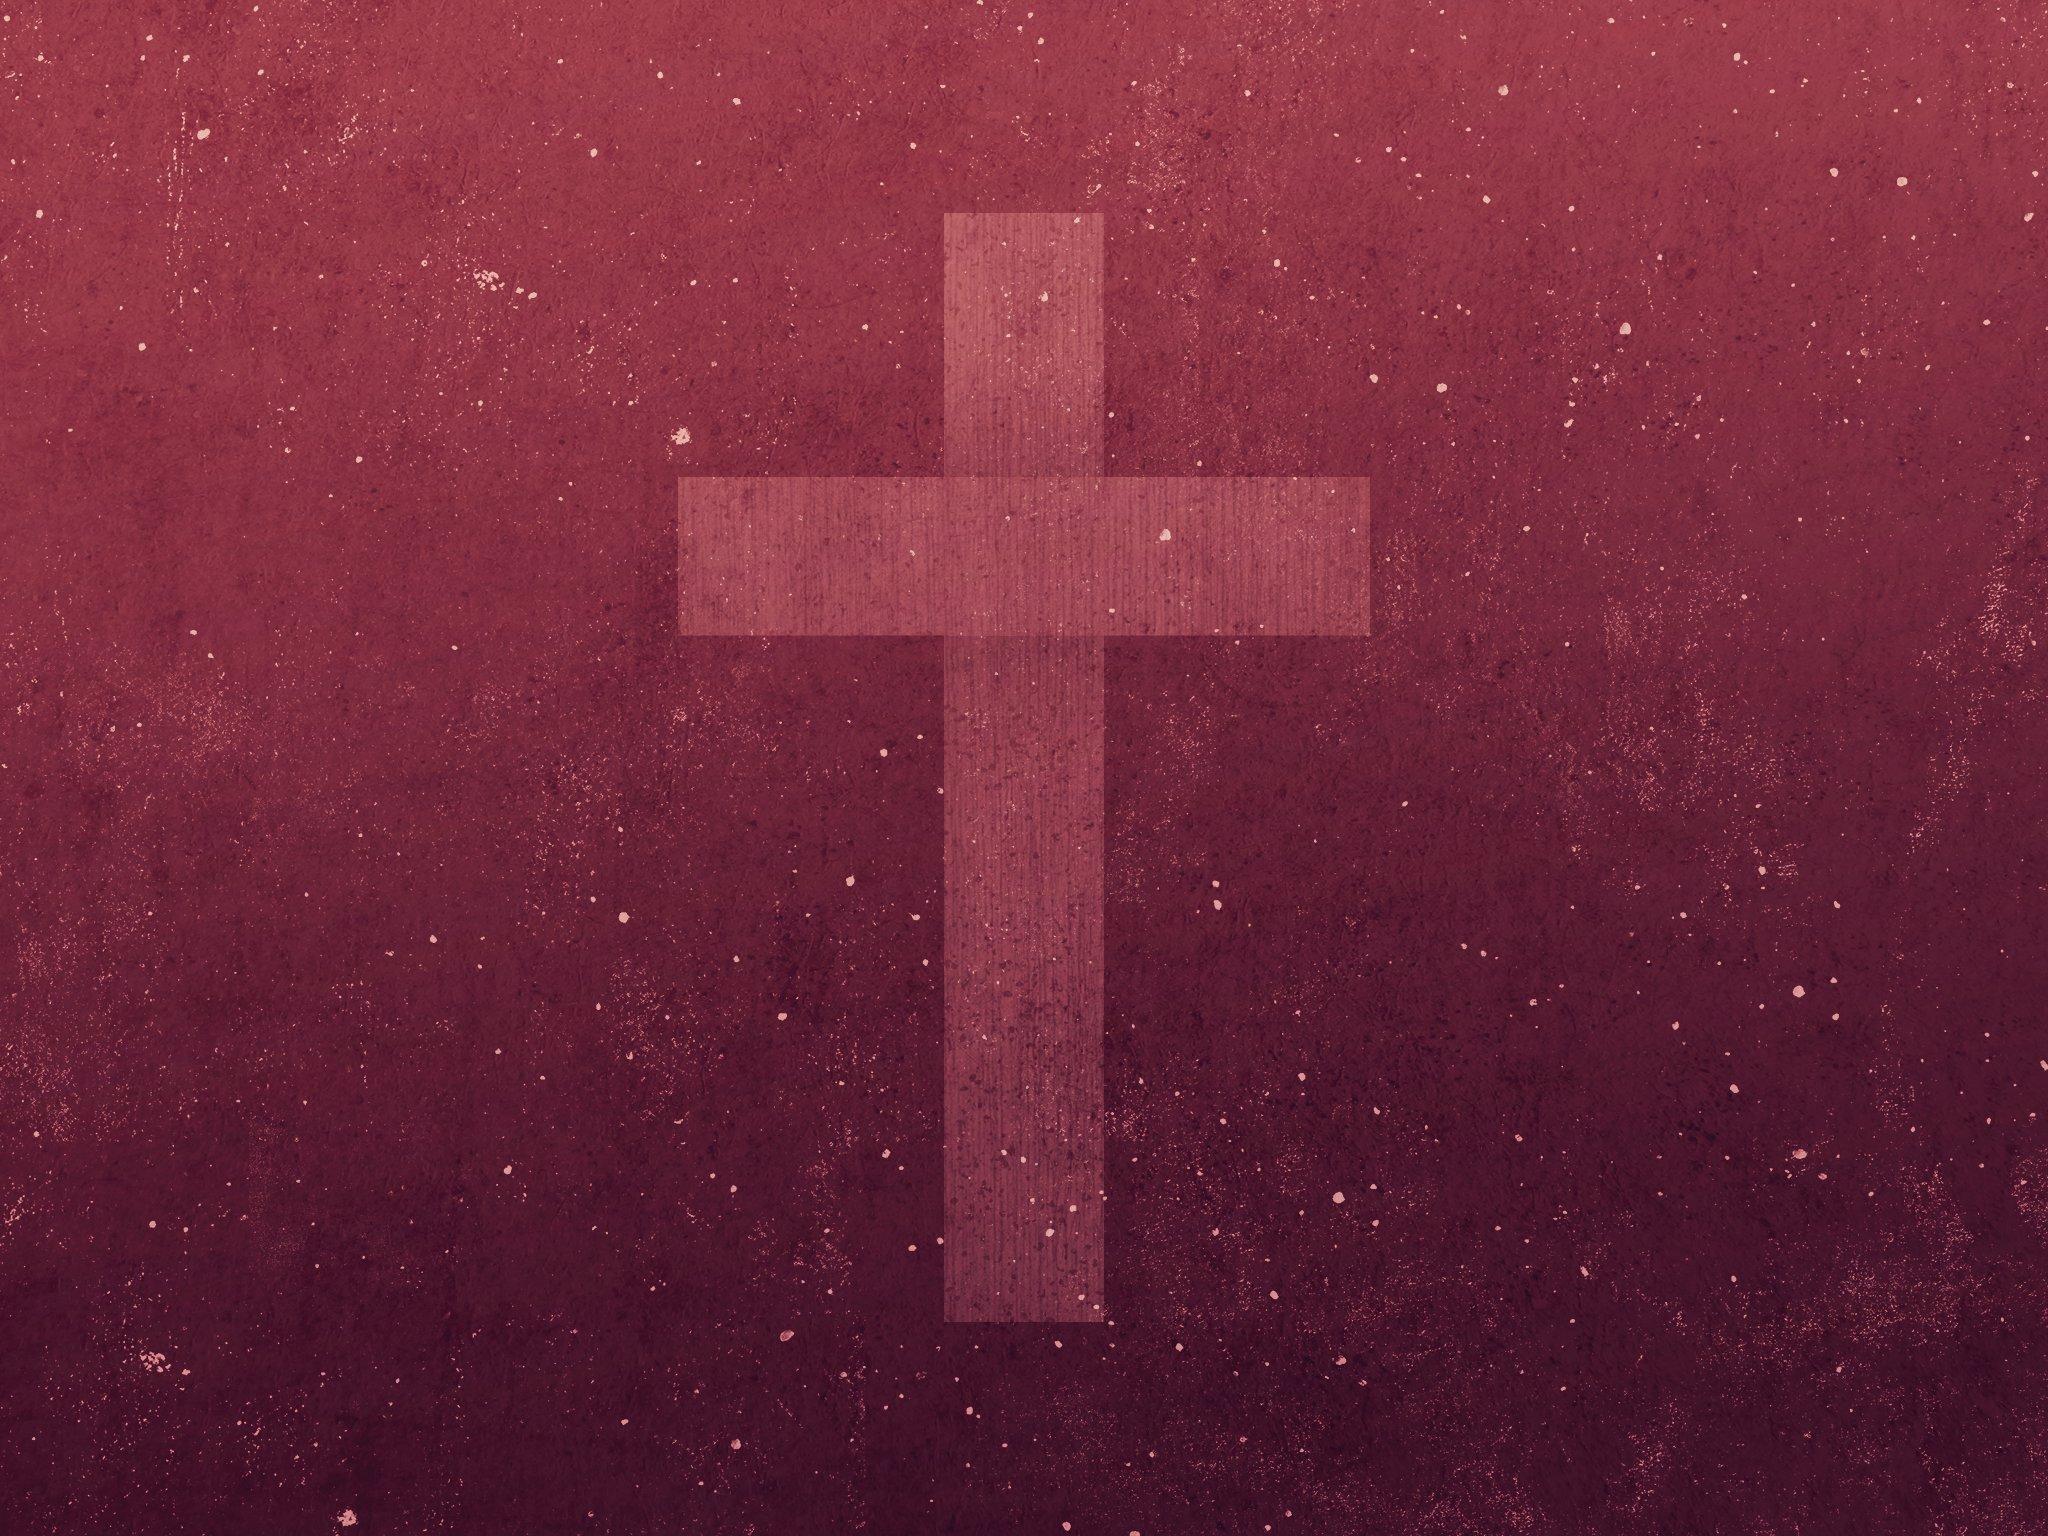 Gospel-and-Acts_Blank_4x3-fullscreen.jpg